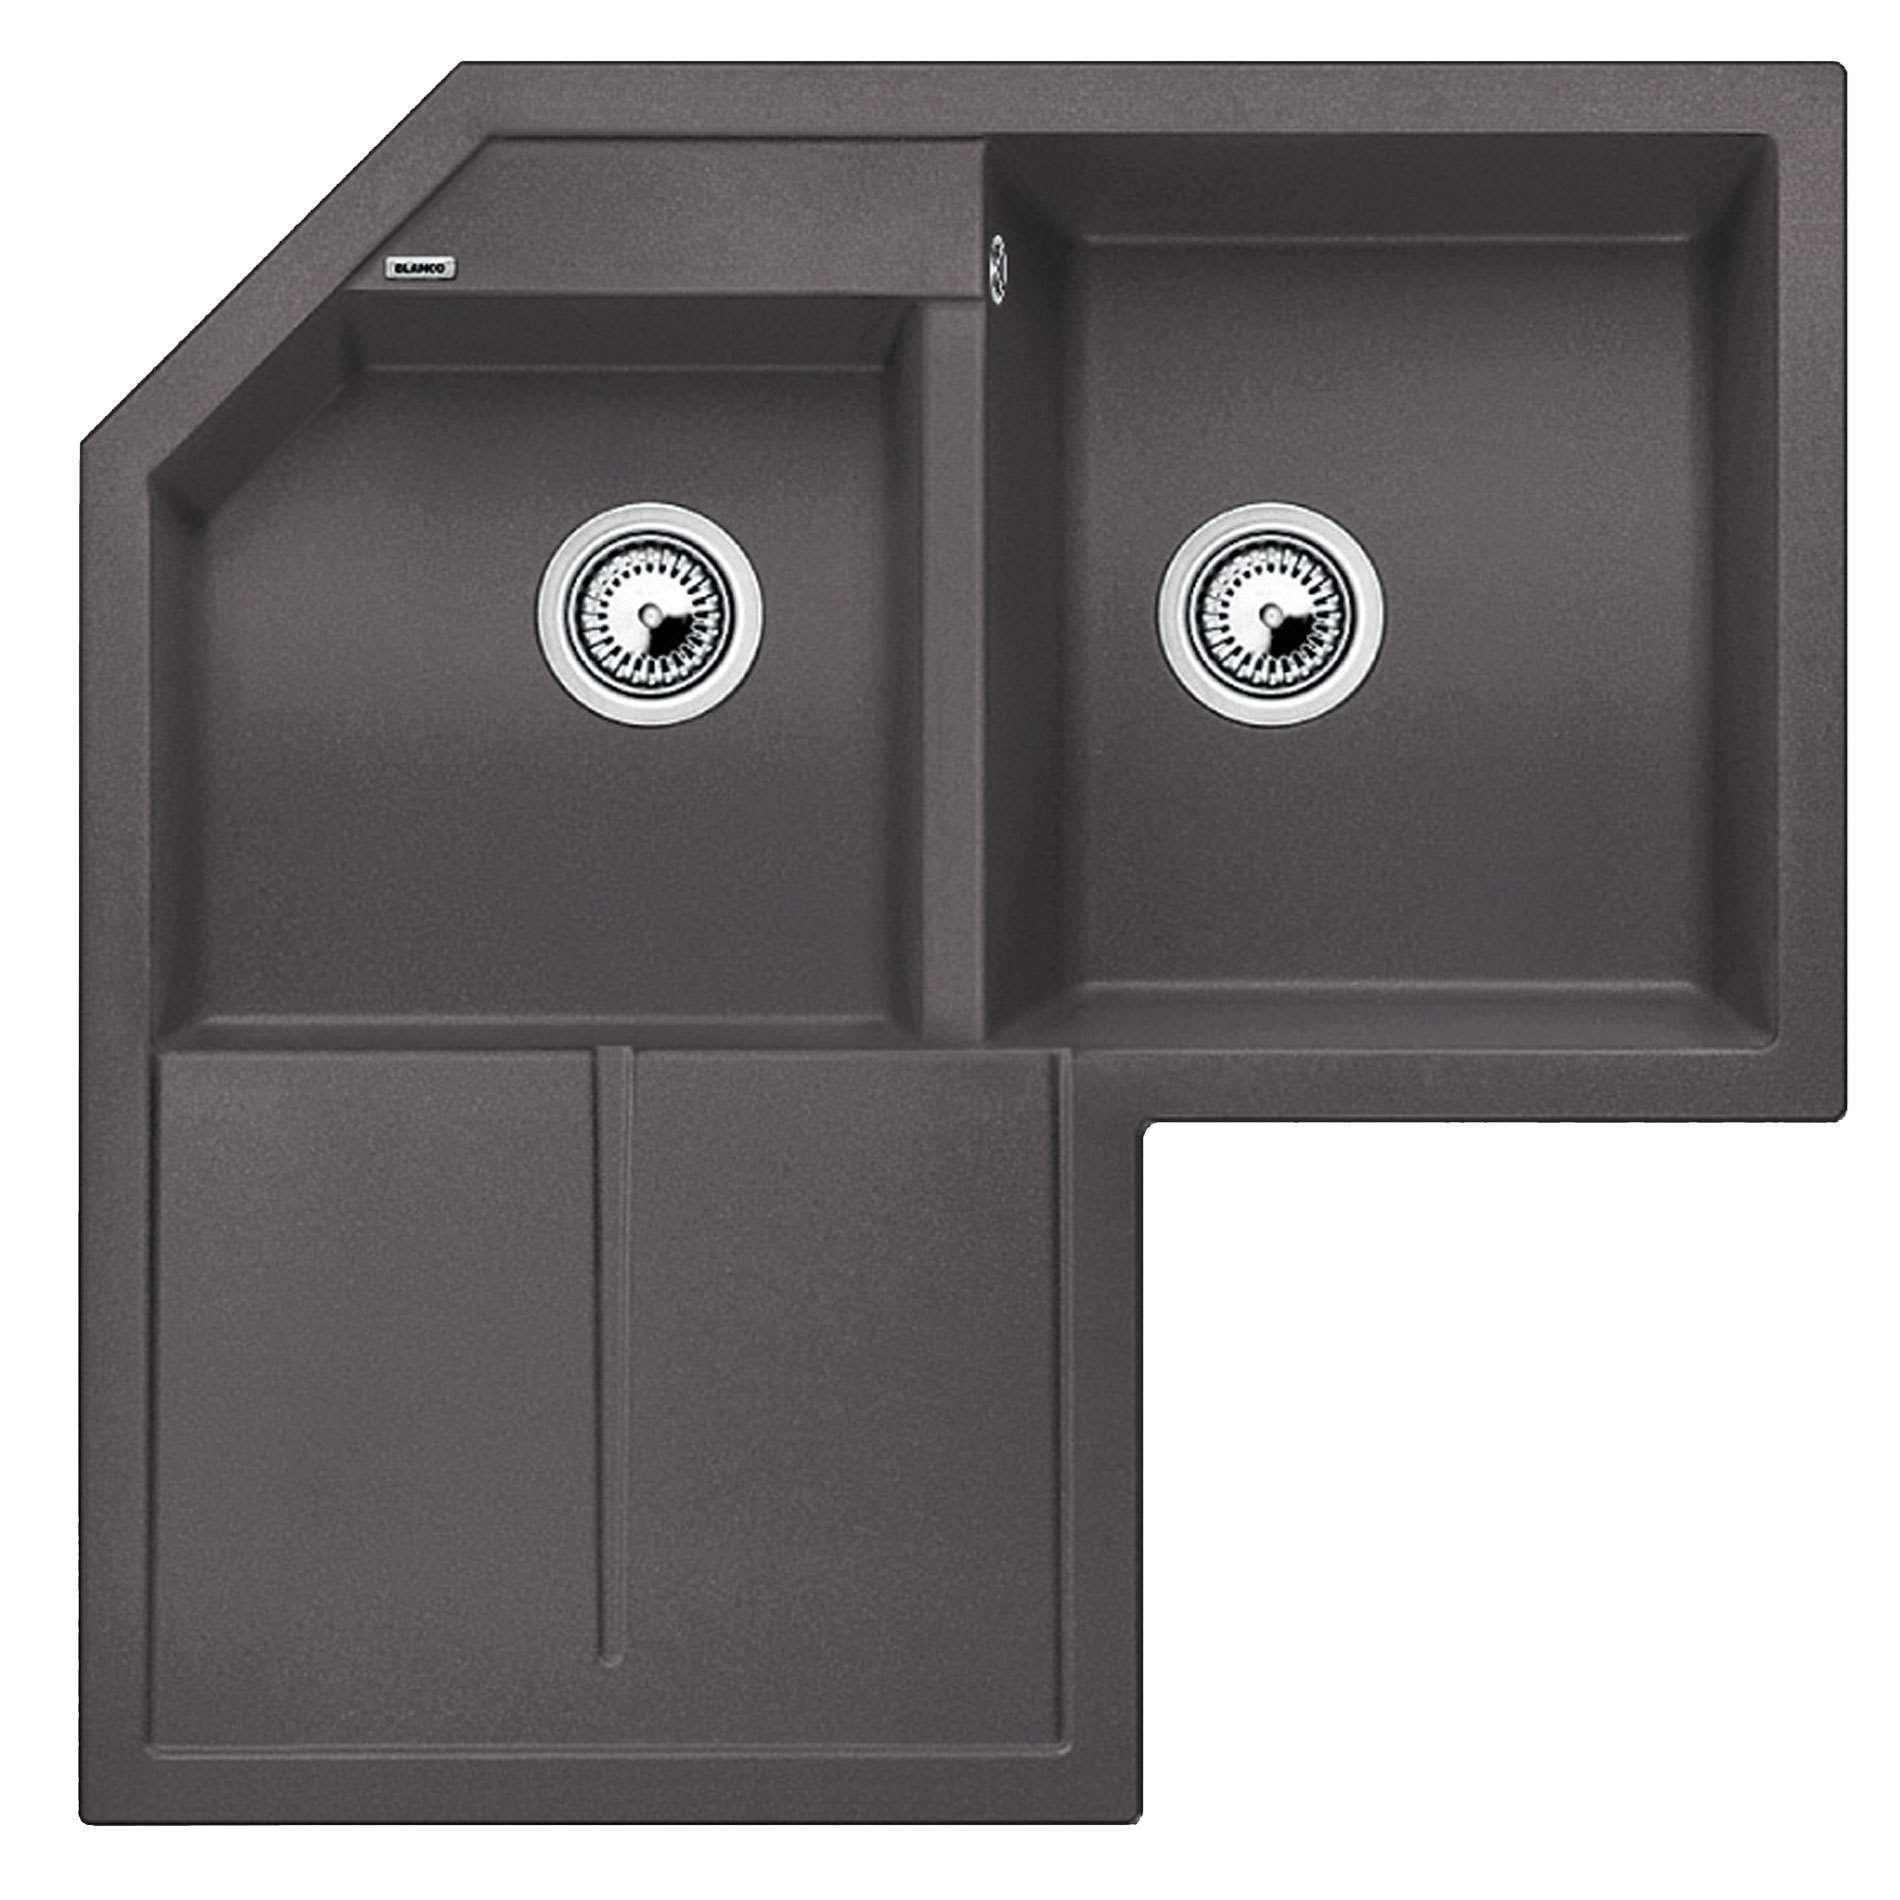 Blanco Grey Sink : Blanco: Metra 9 E Rock Grey Silgranit Sink - Kitchen Sinks & Taps